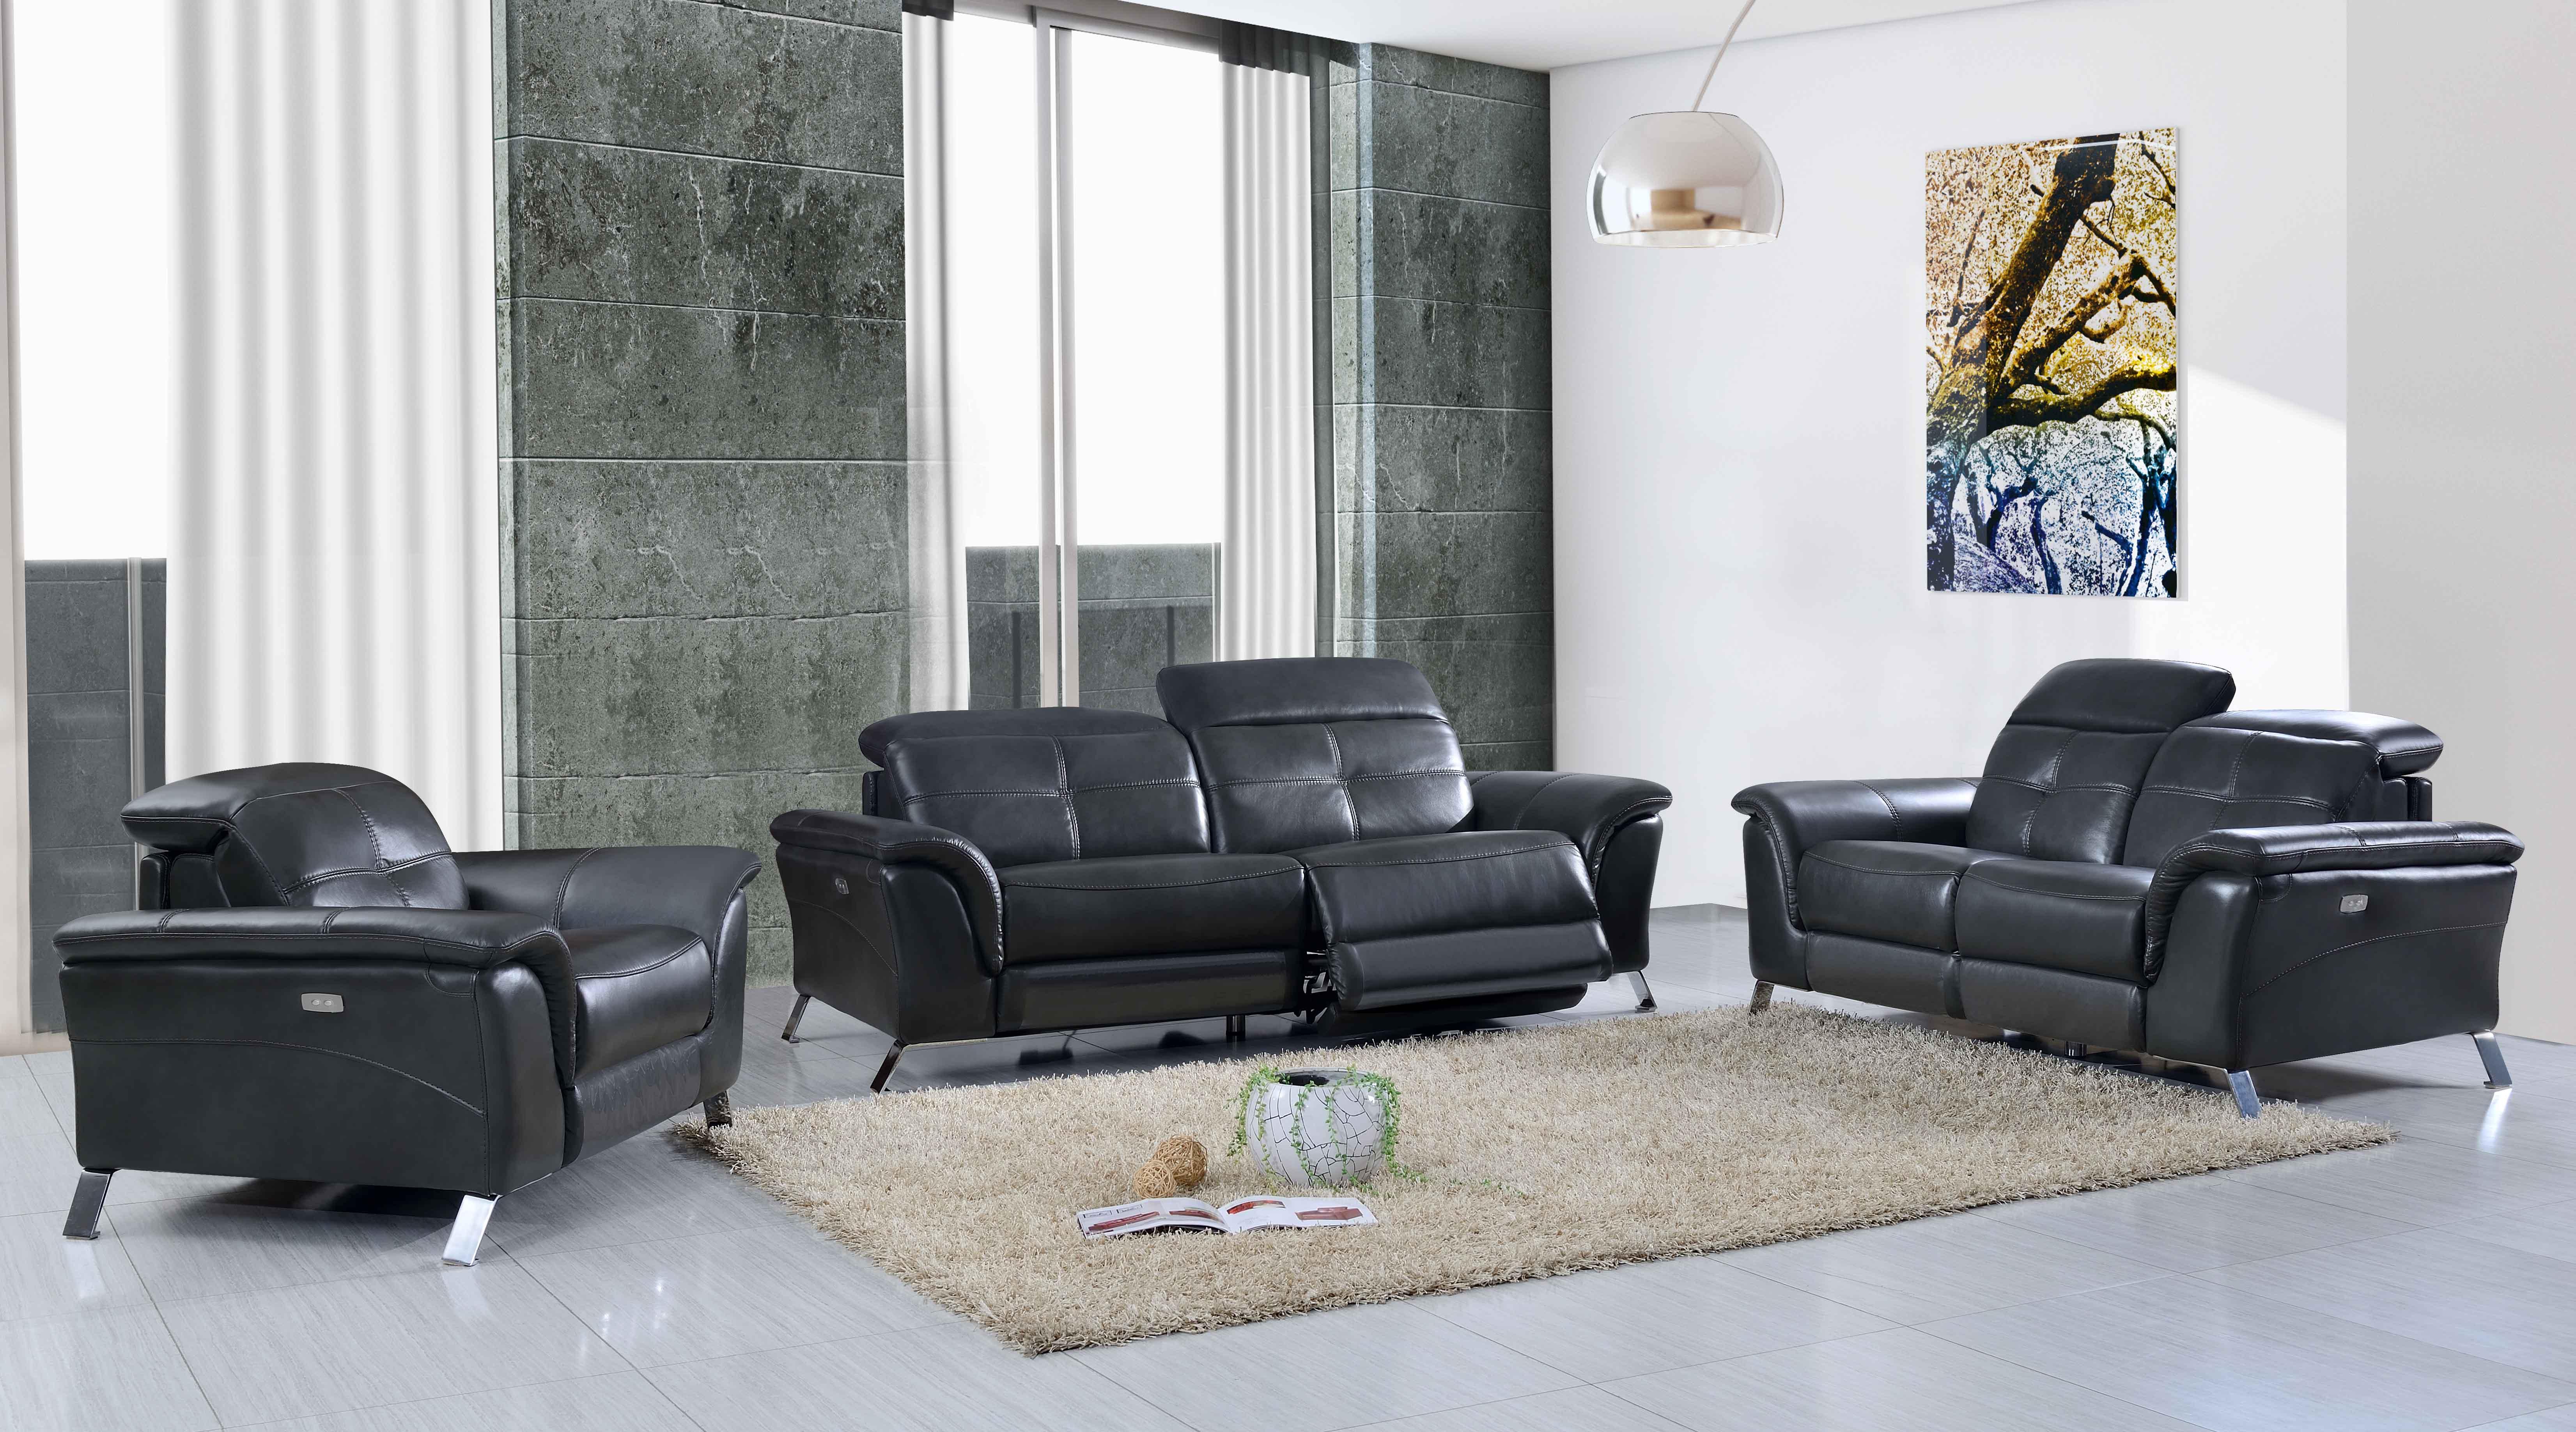 Italian Leather Sofa Set with Steel Legs